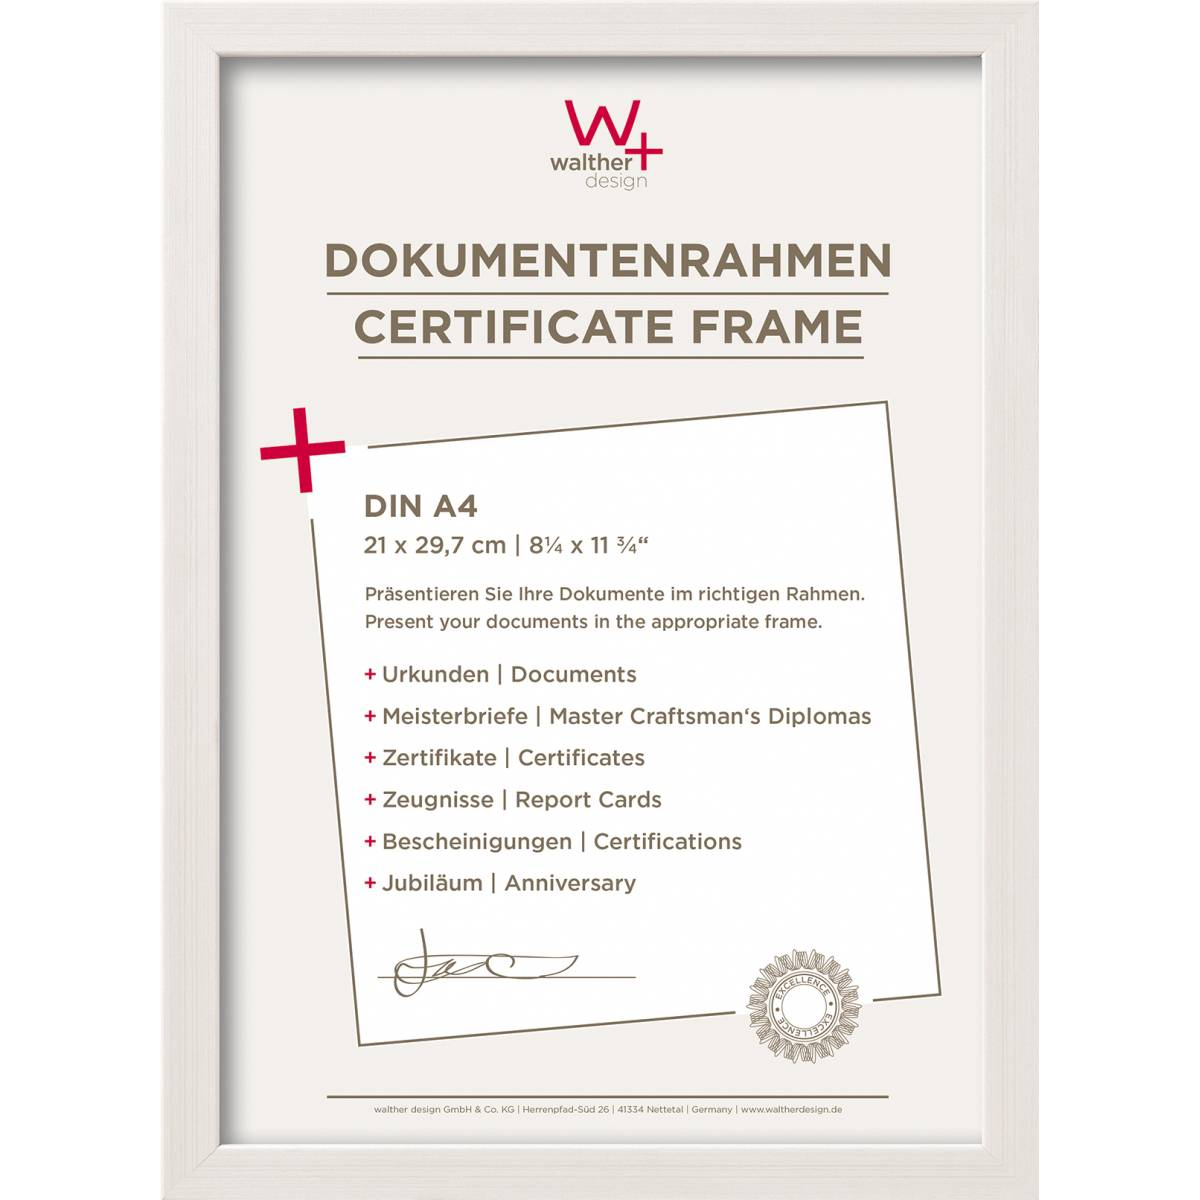 Construction PS-Rahmen - walther design GmbH & Co. KG